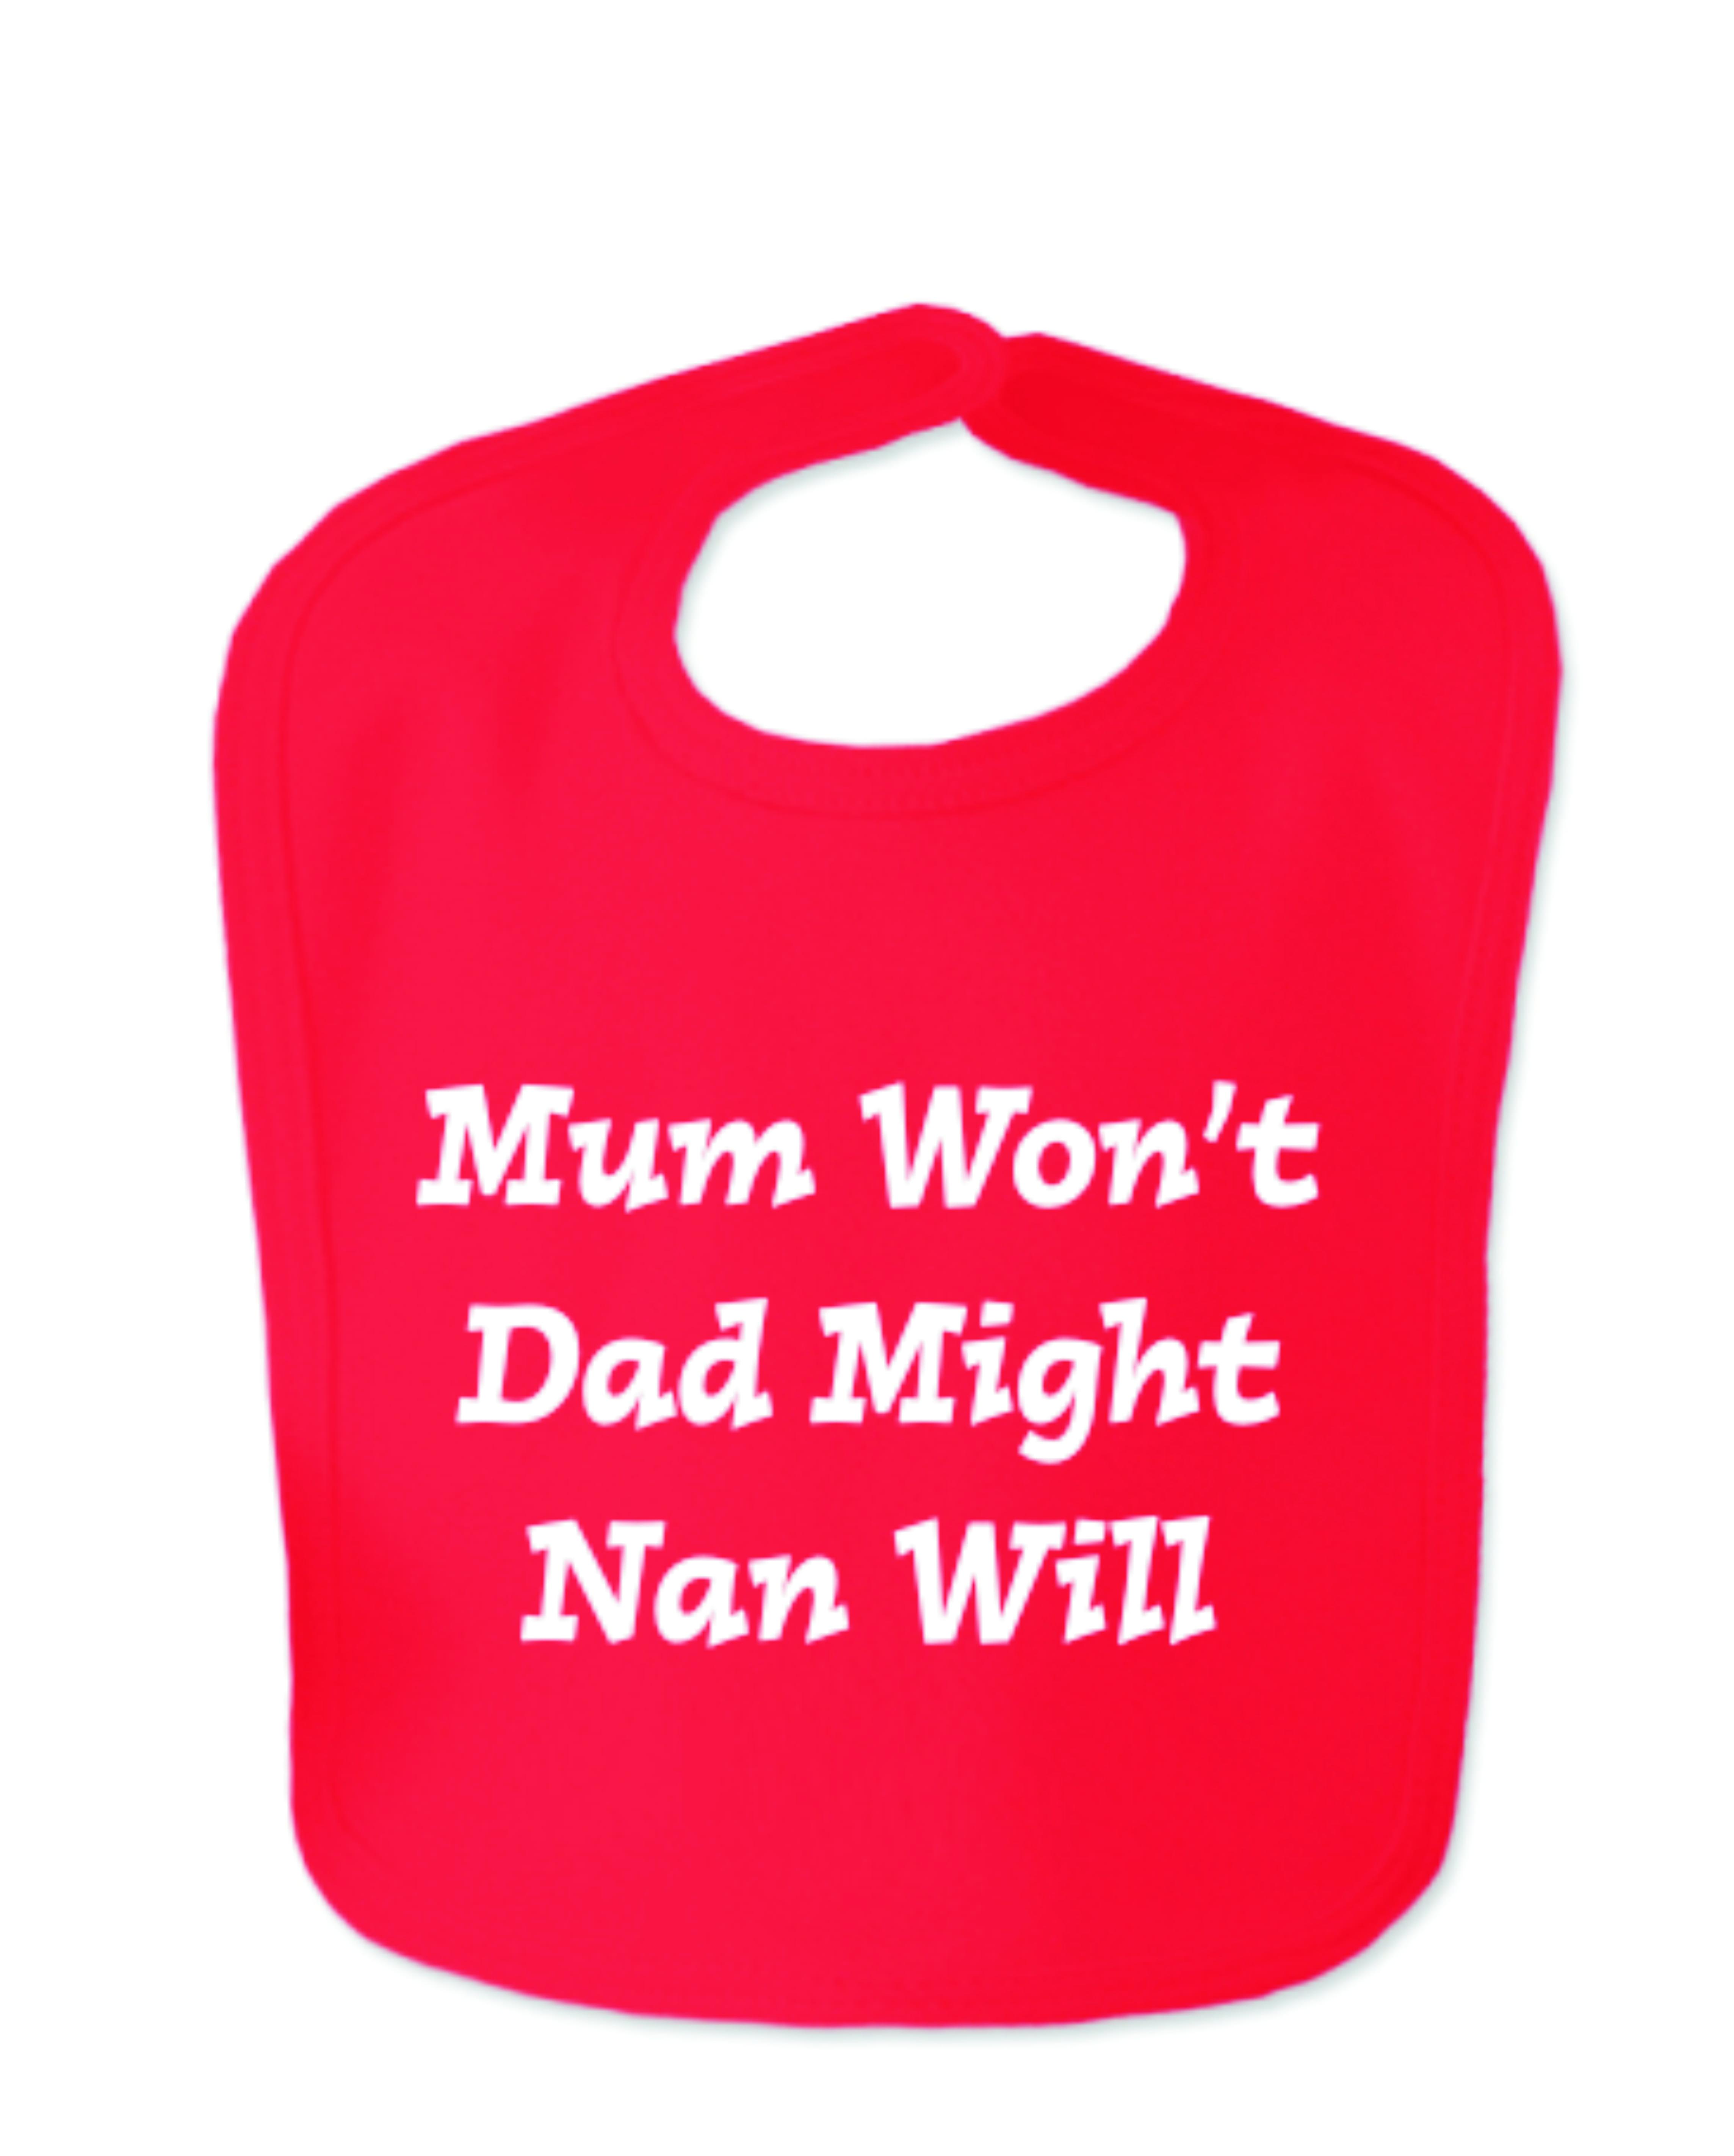 Red Mum Won't Dad Might Nan Will Velcro Baby Bib